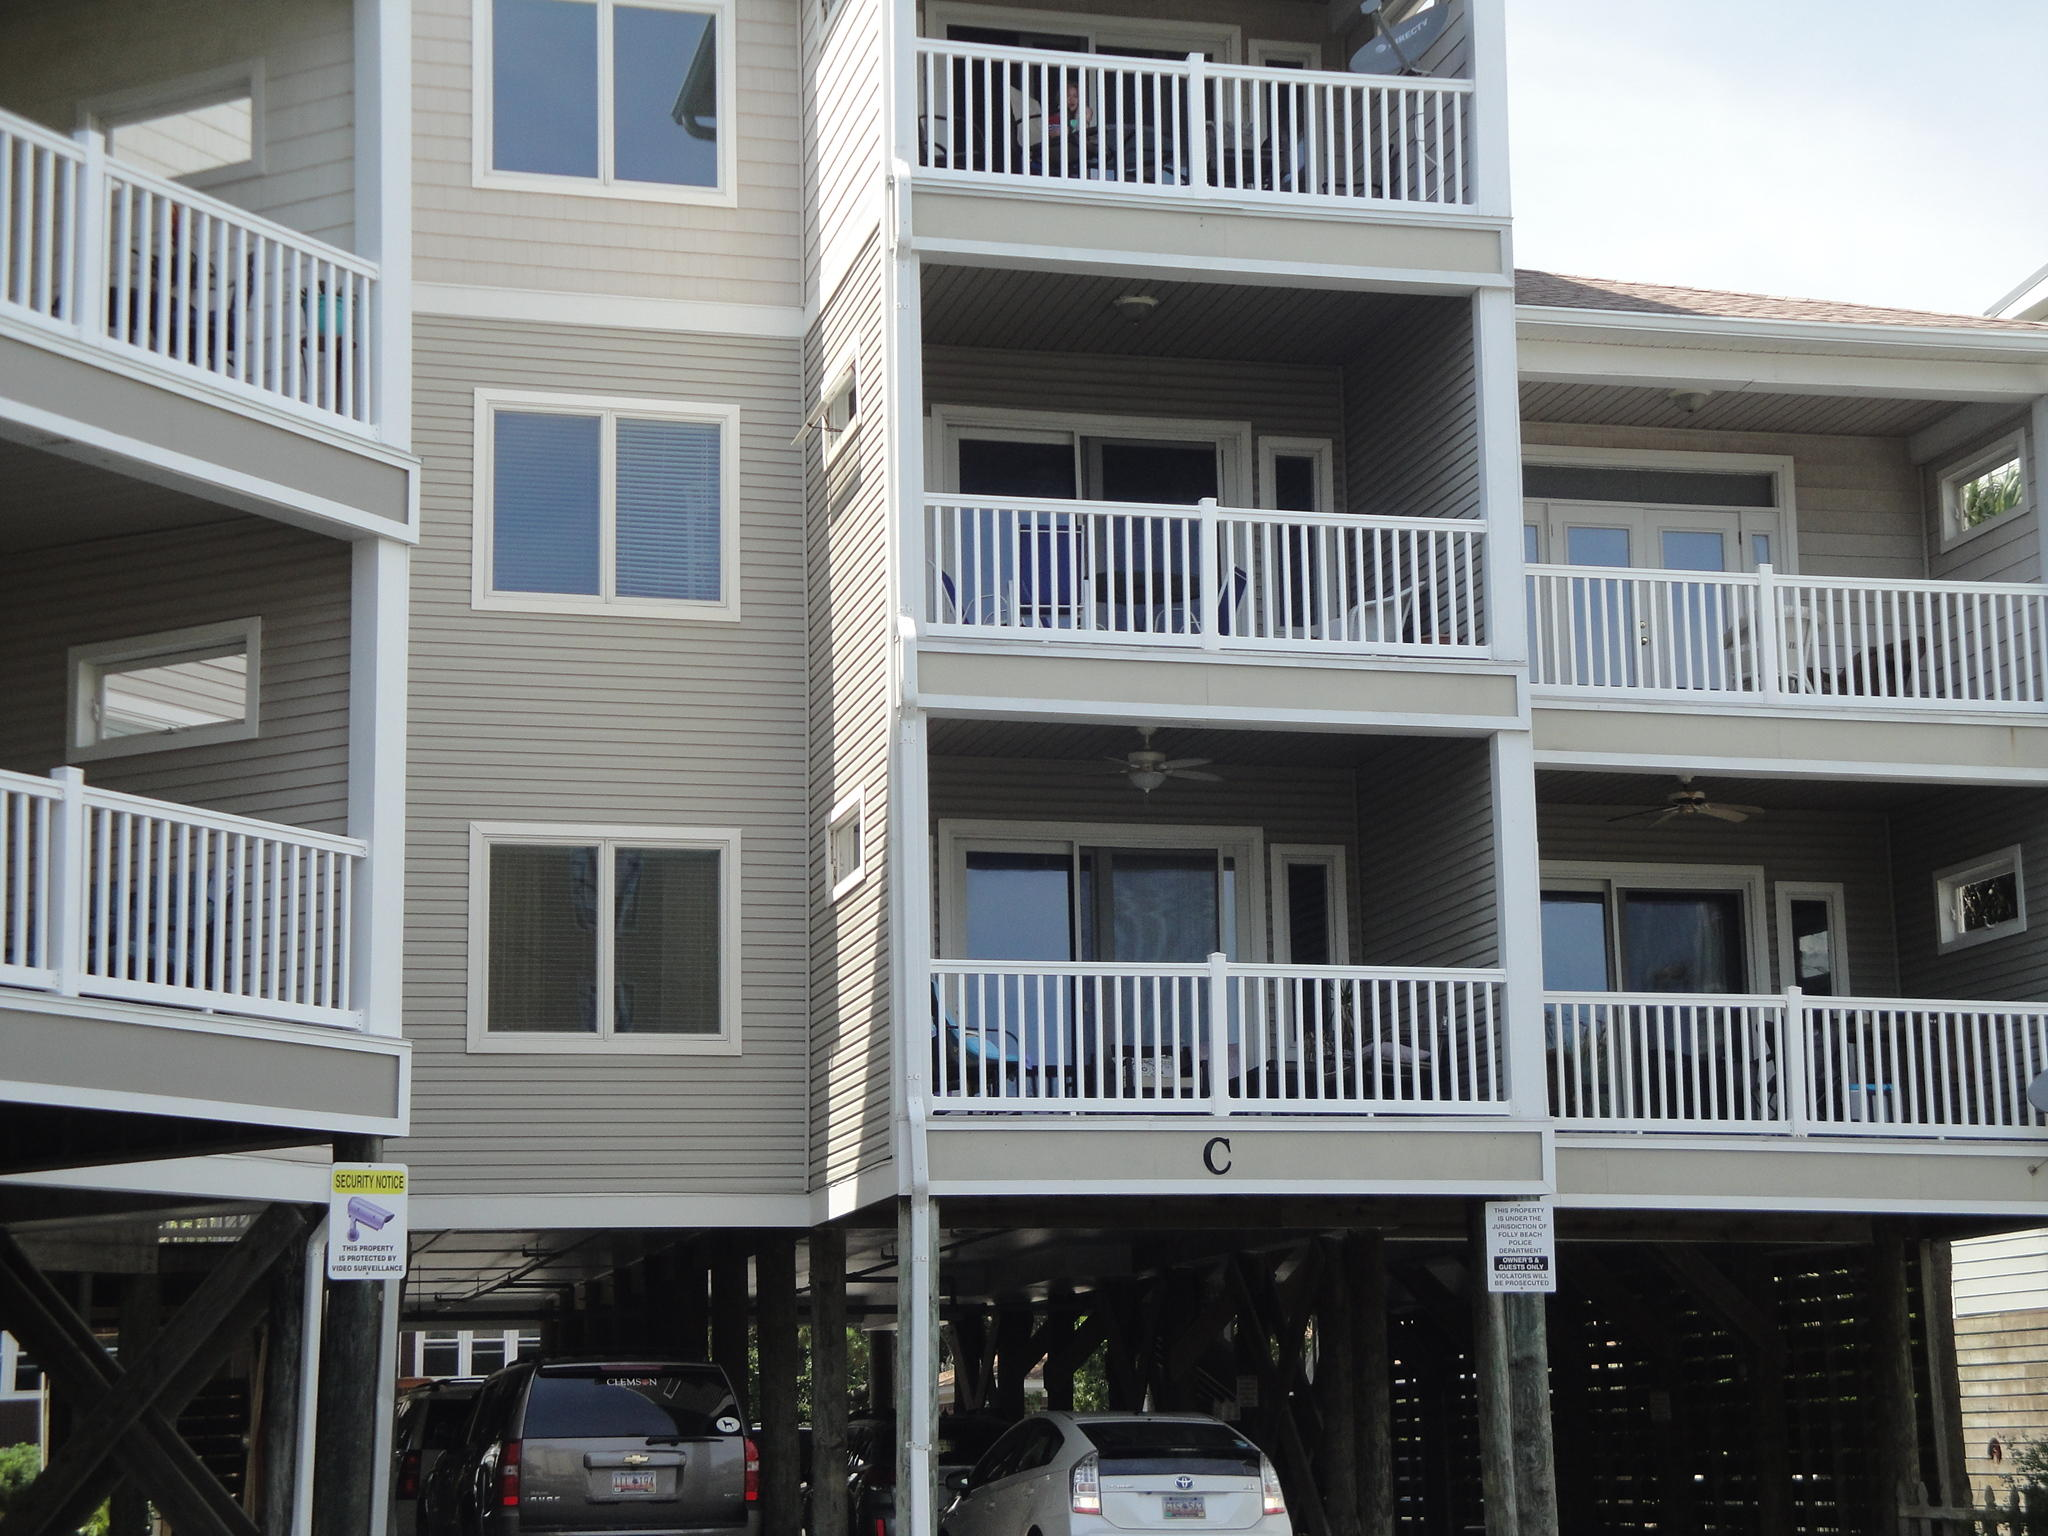 Pier Pointe Villas Homes For Sale - 117 Ashley, Folly Beach, SC - 20